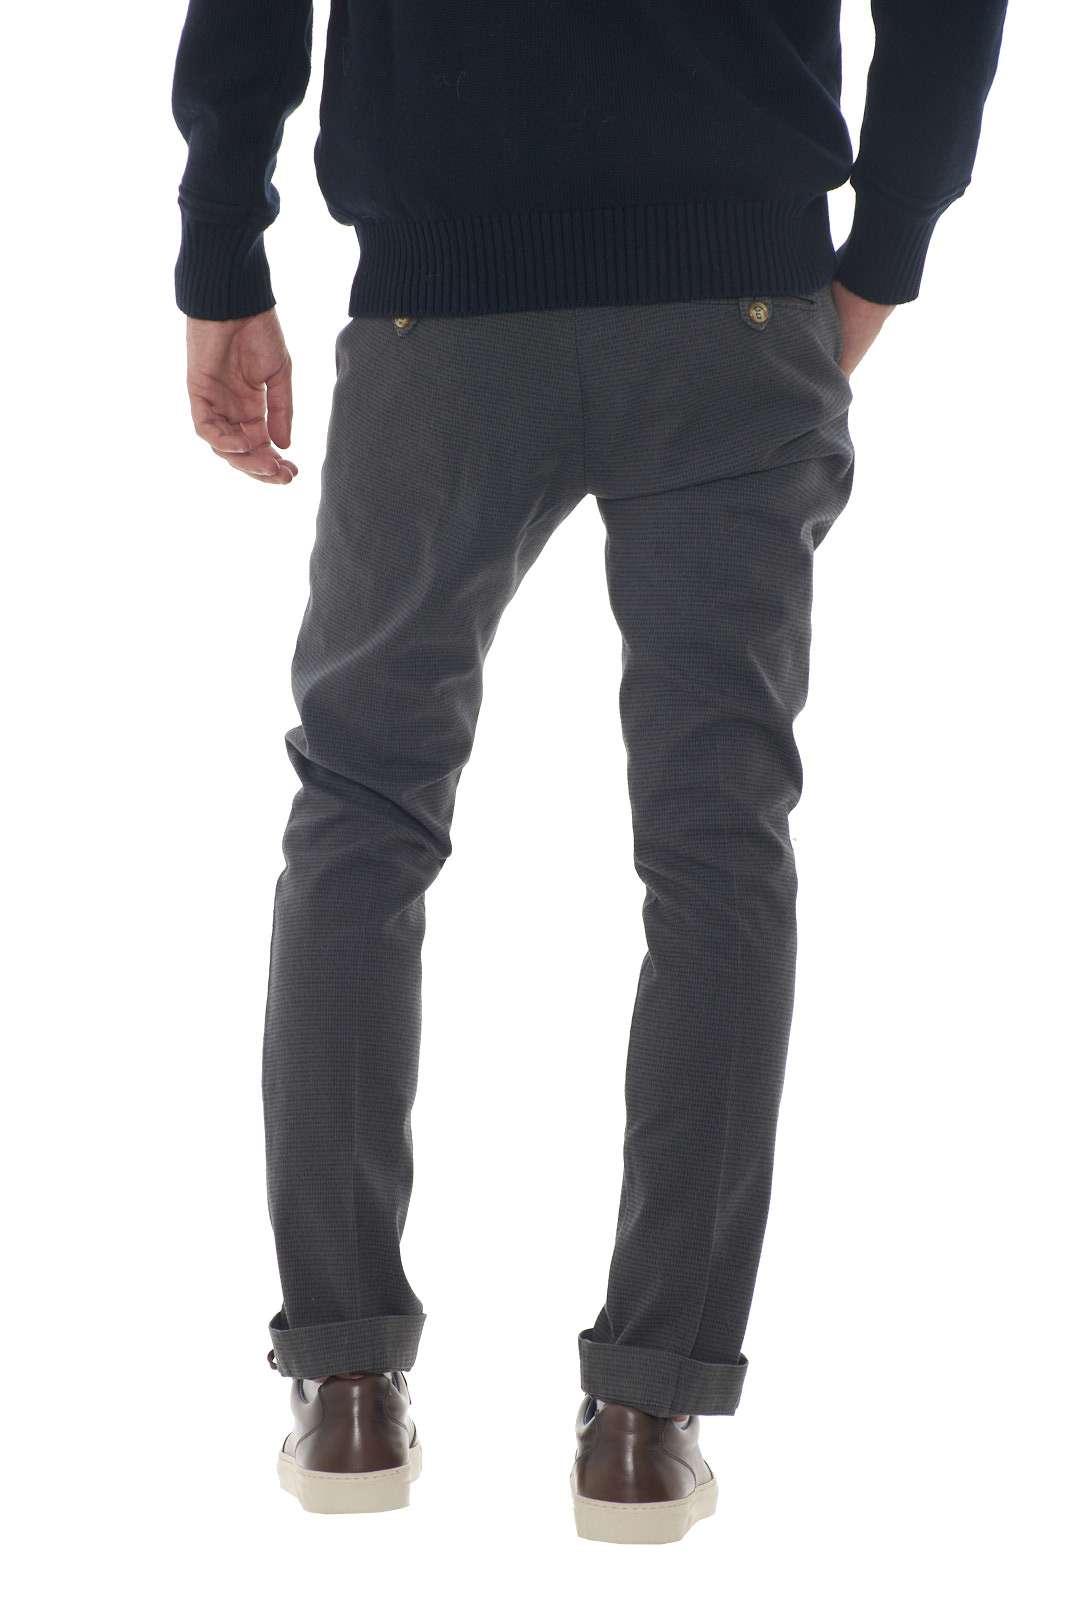 https://www.parmax.com/media/catalog/product/a/i/AI-outlet_parmax-pantaloni-uomo-Entre-Amis-A208358%201788-C.jpg